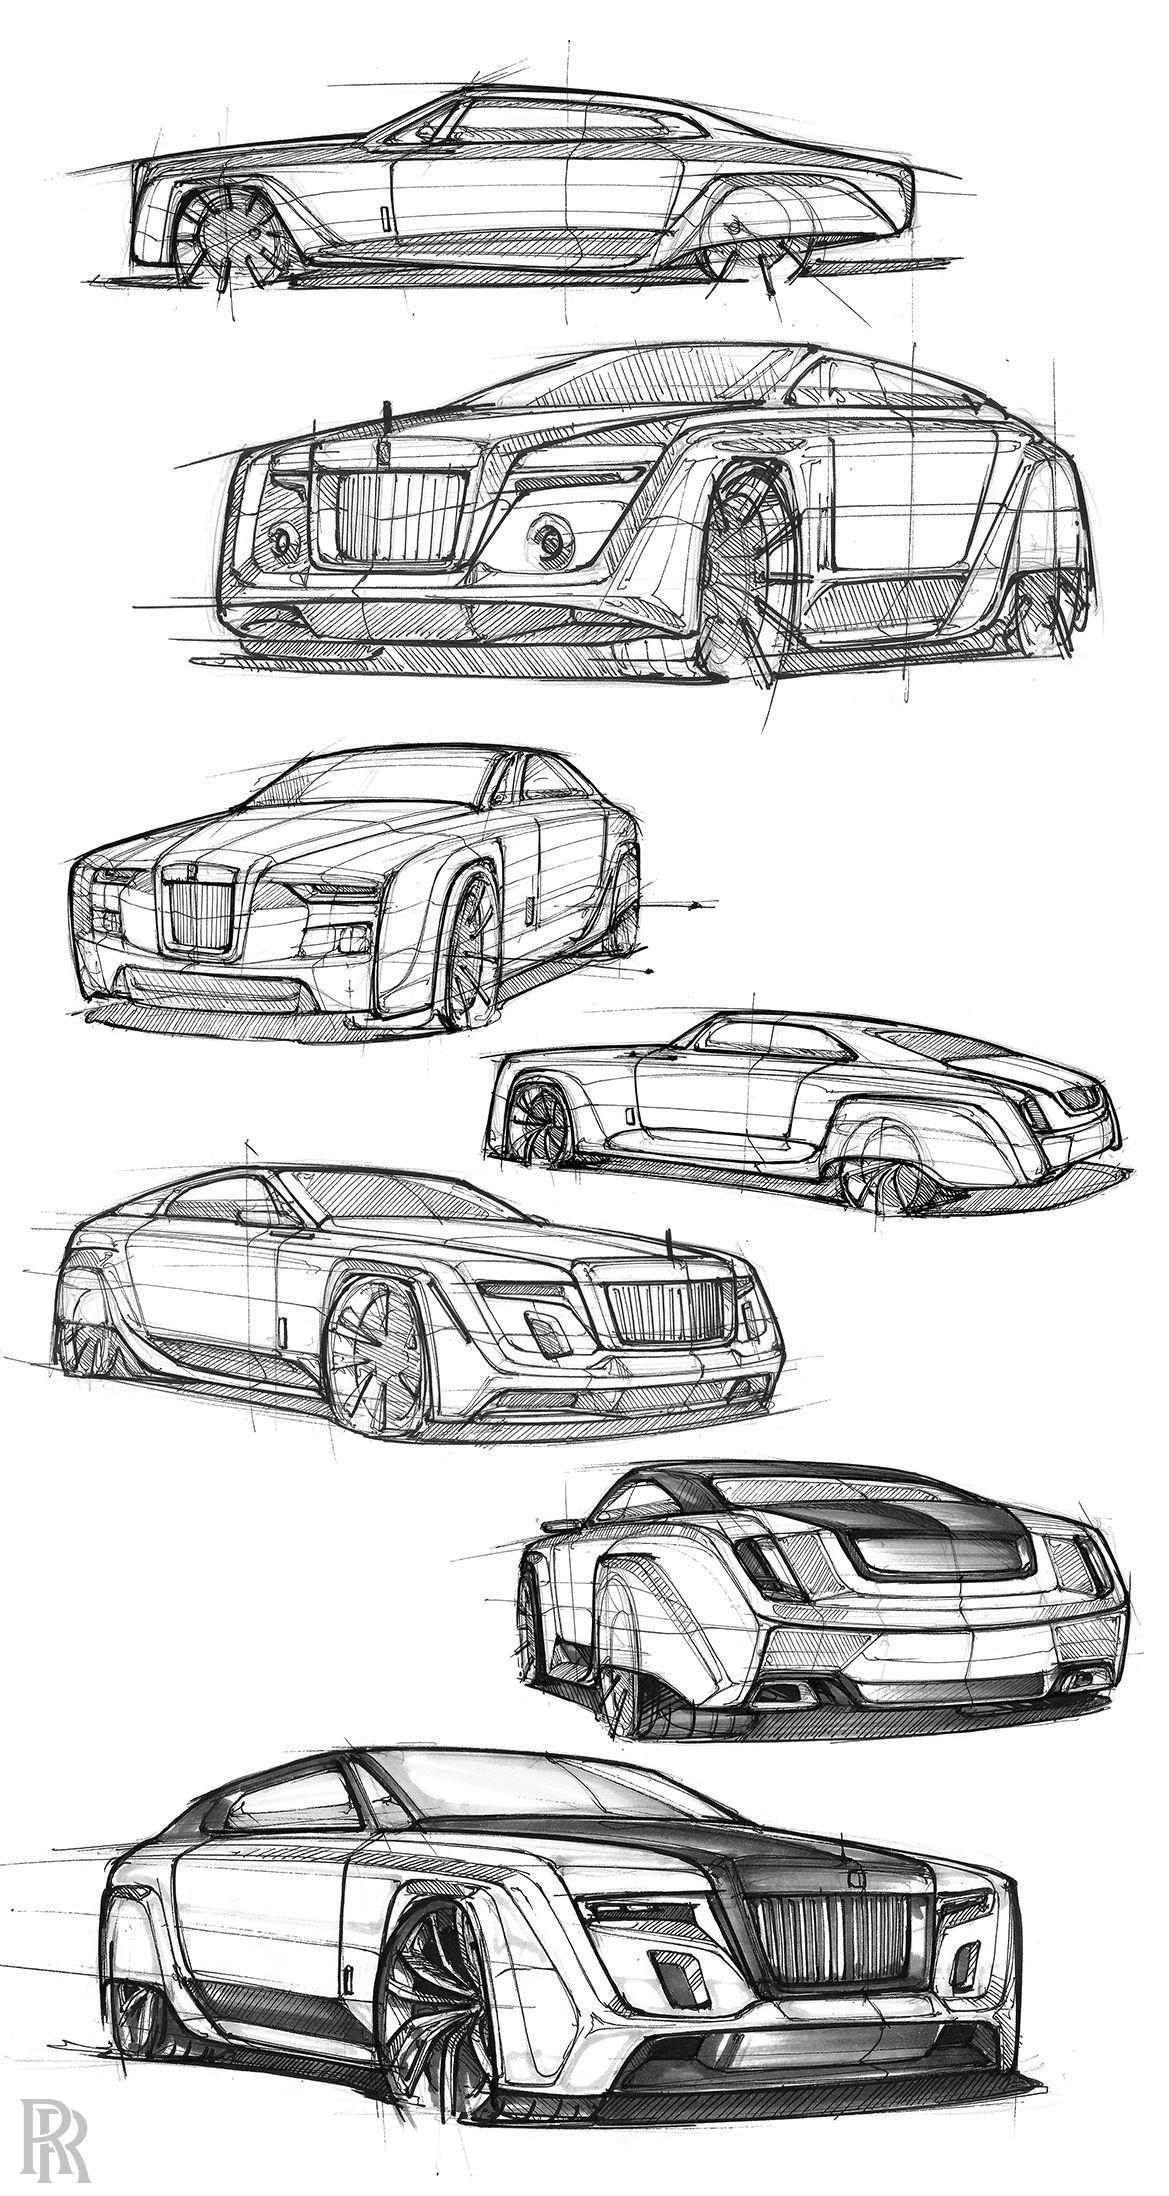 2050 Rolls Royce Phantom On Behance Car Drawings Futuristic Cars Design Car Design